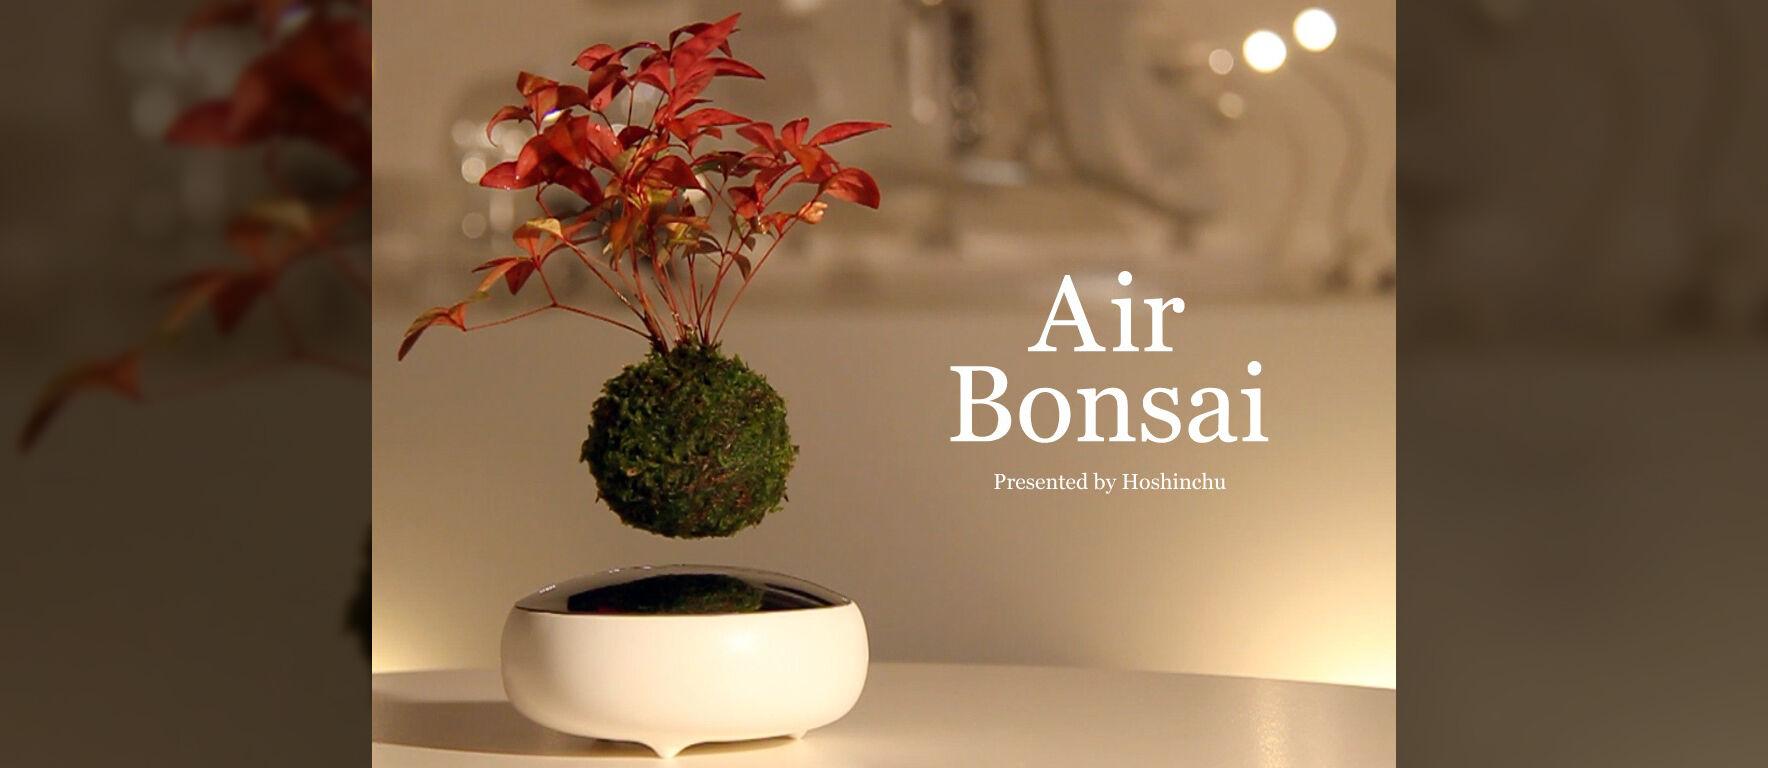 Wow! Proyek Air Bonsai Sudah Kumpulkan Lebih dari 7,5 Miliar Rupiah!